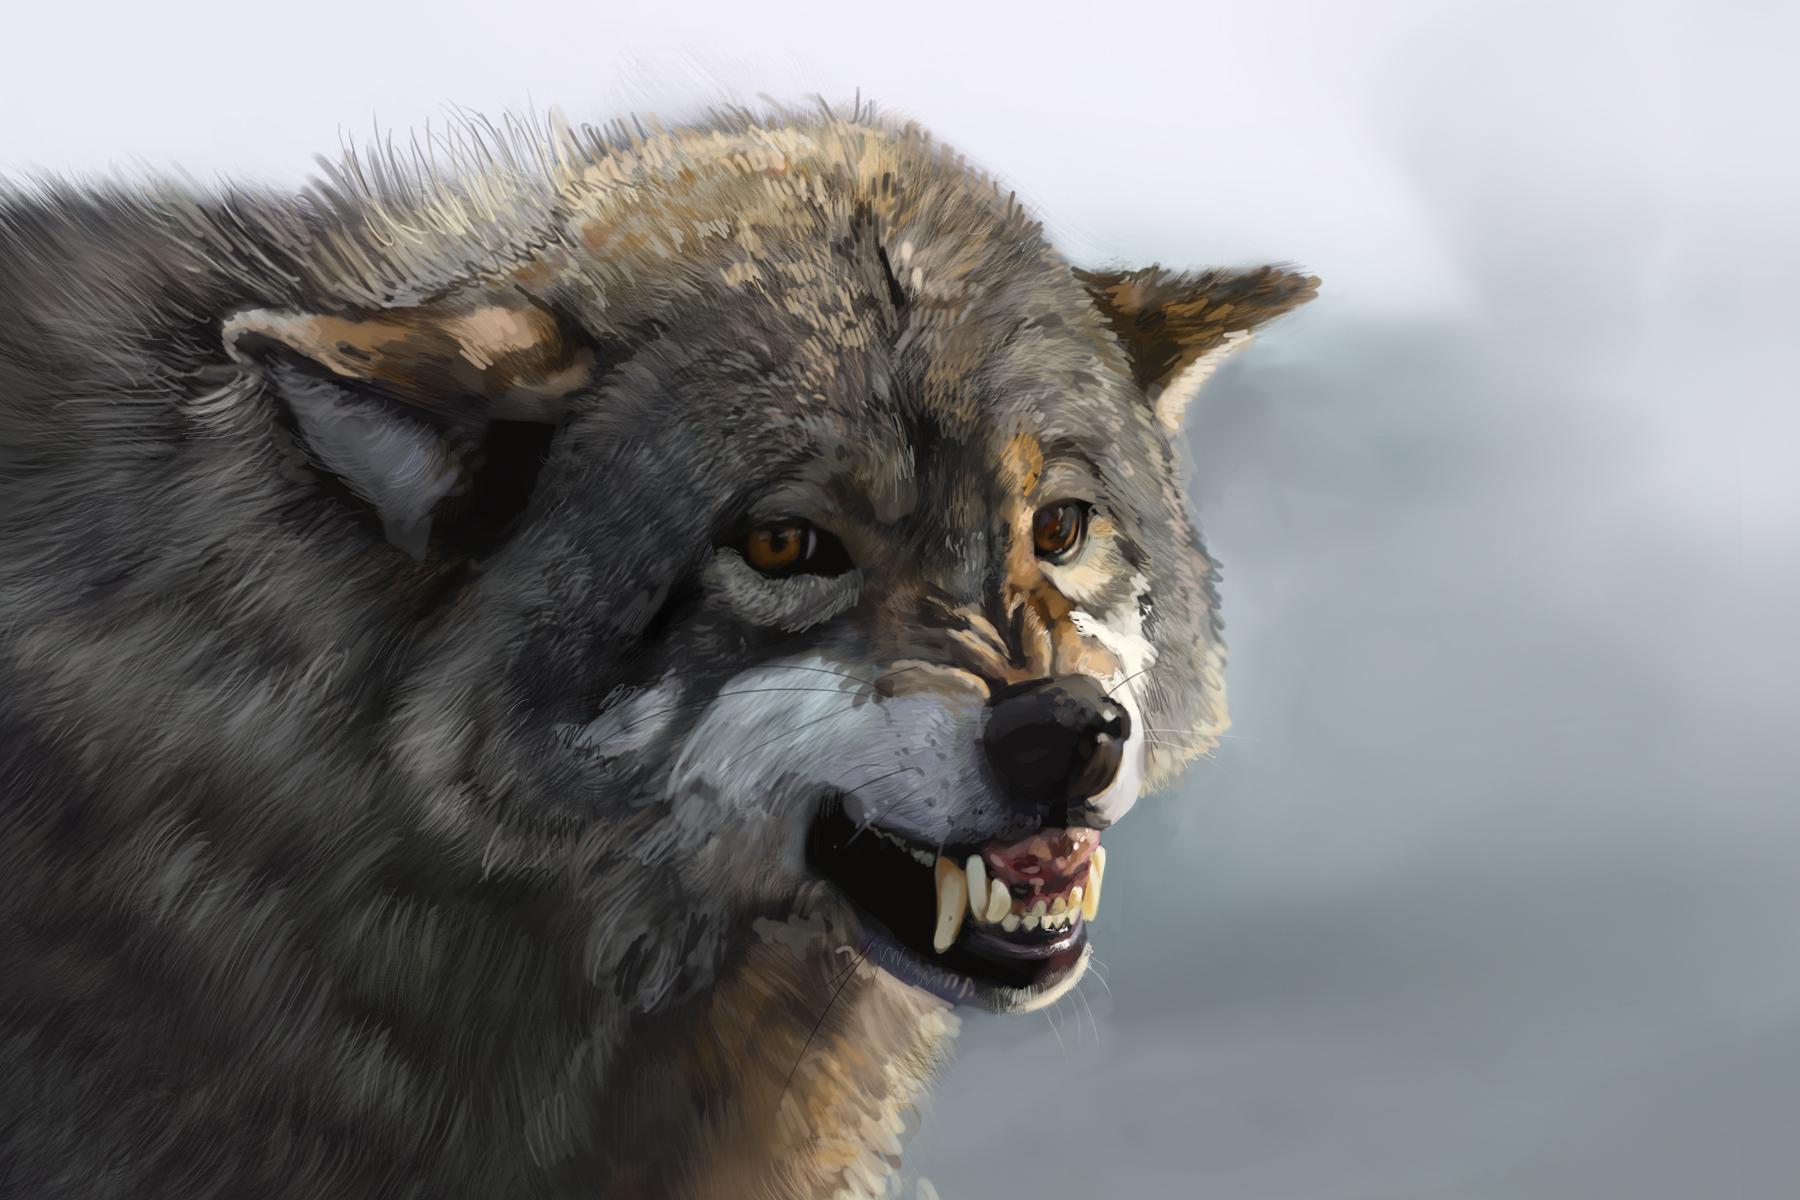 animal april challenge - study 11 by teyoliia